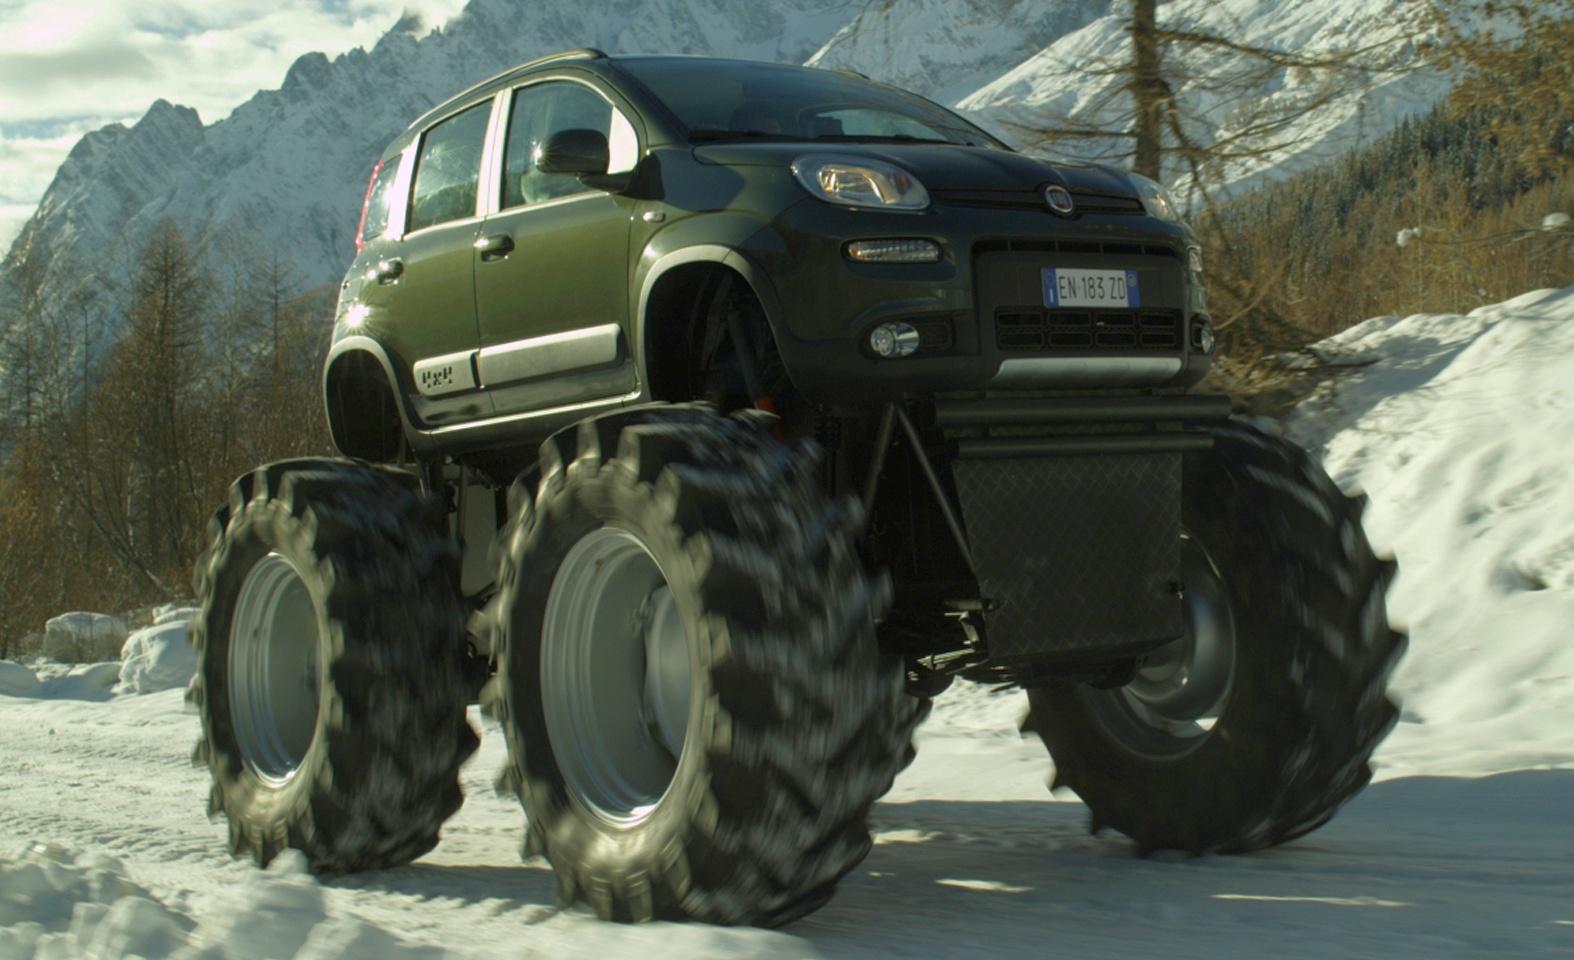 Fiat Panda Monster Truck Big Wheels Keep On Turning Image